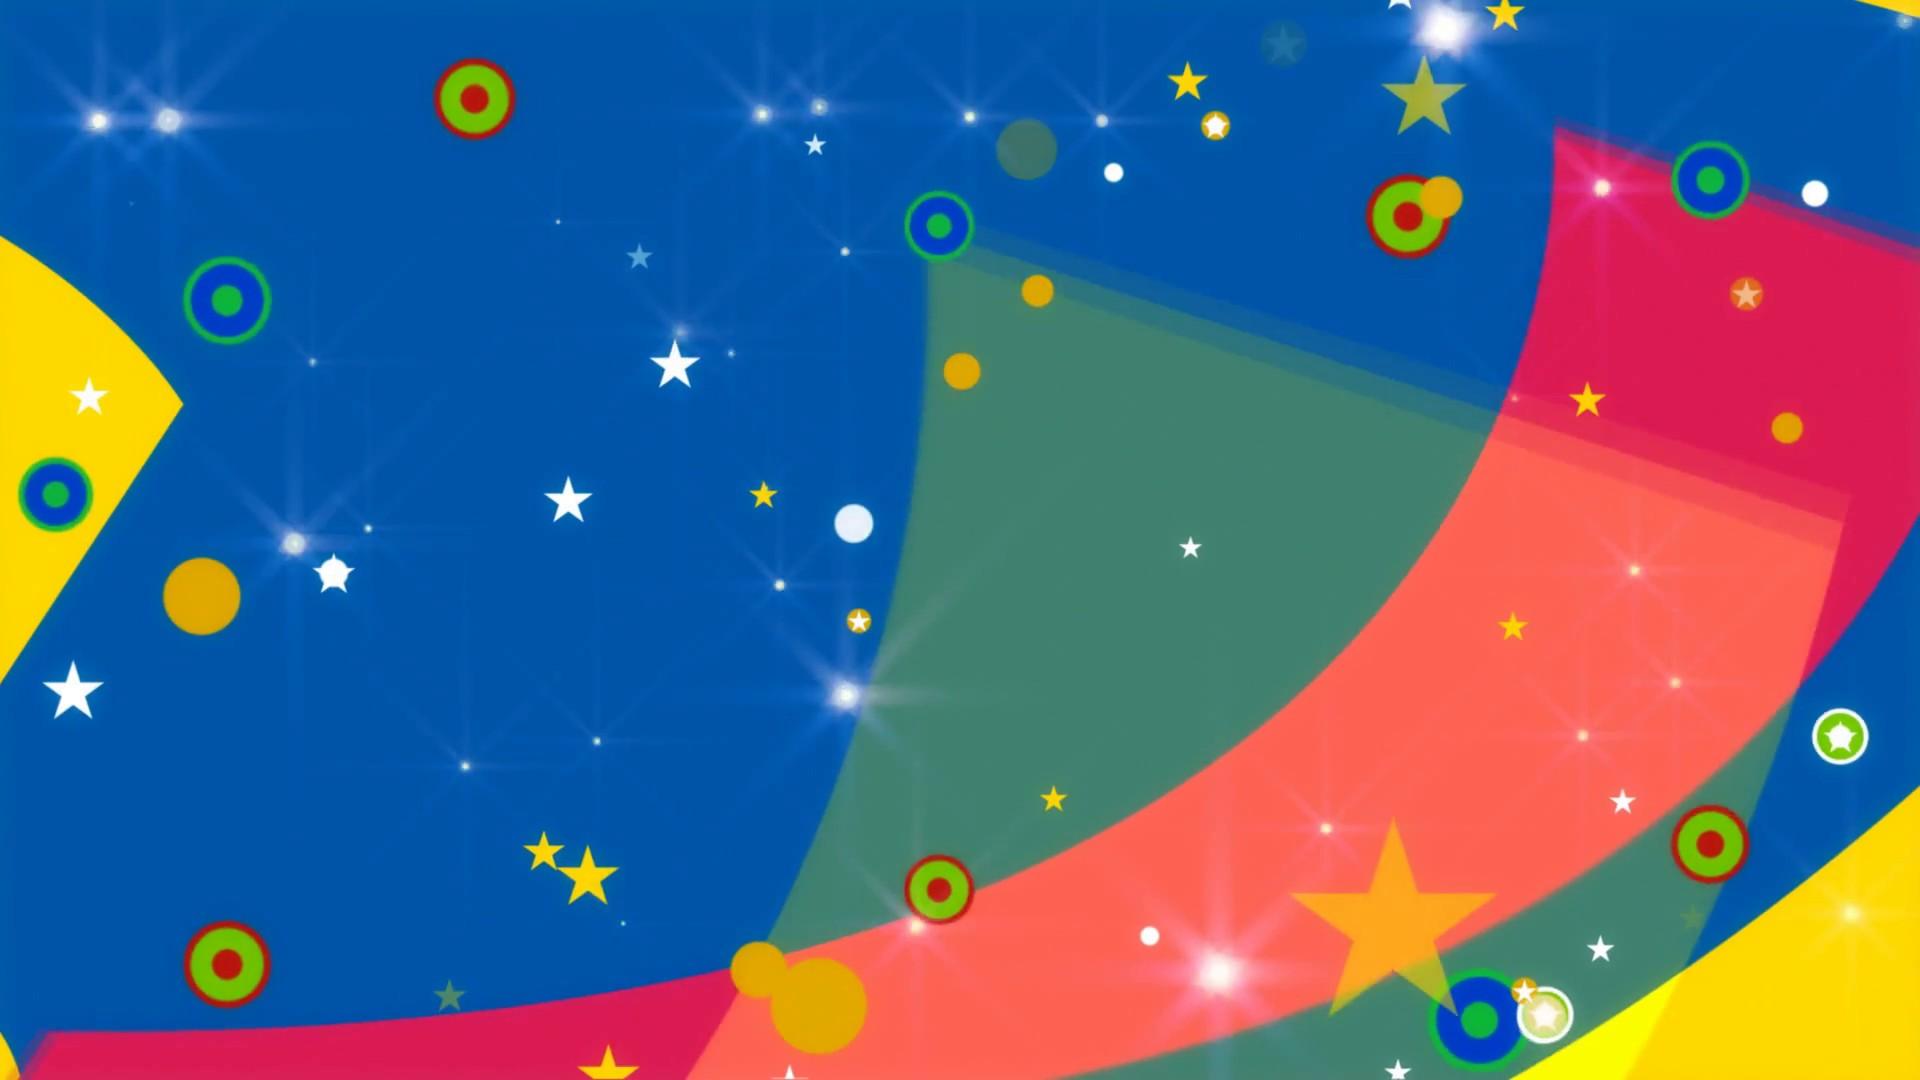 happy birthday background  u00b7 u2460 download free stunning